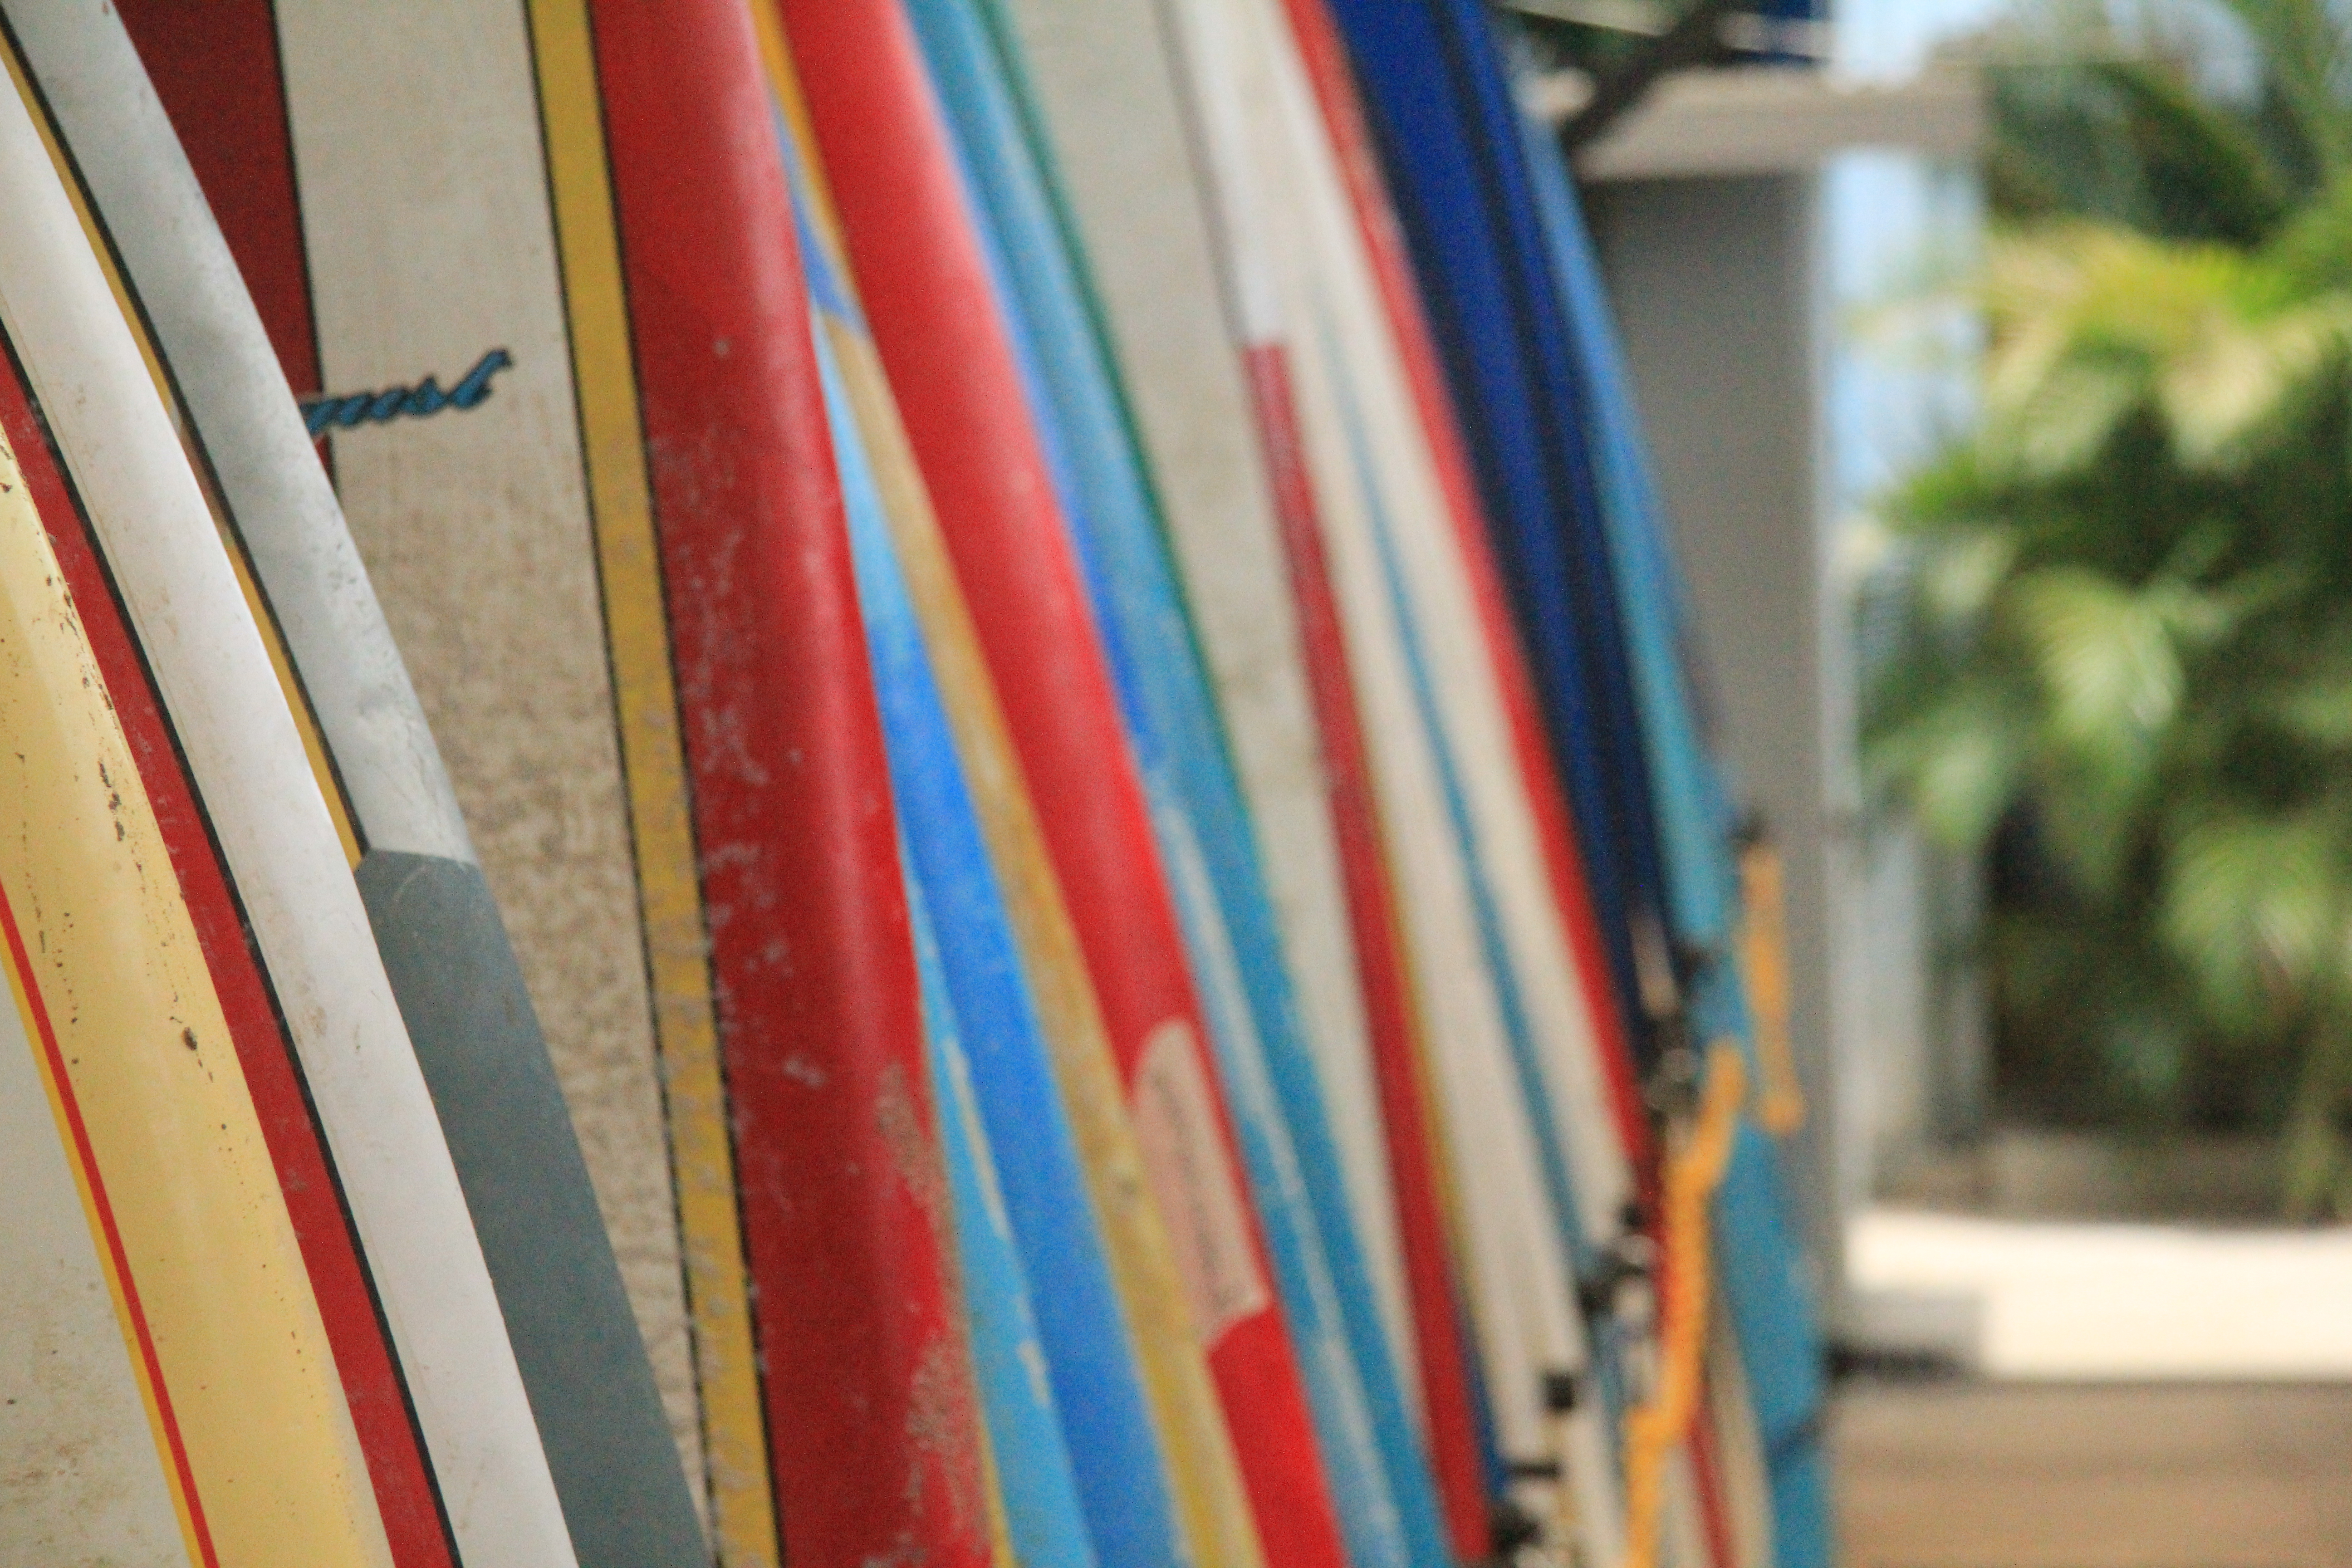 Blue Trailz Tamarindo Board Rental